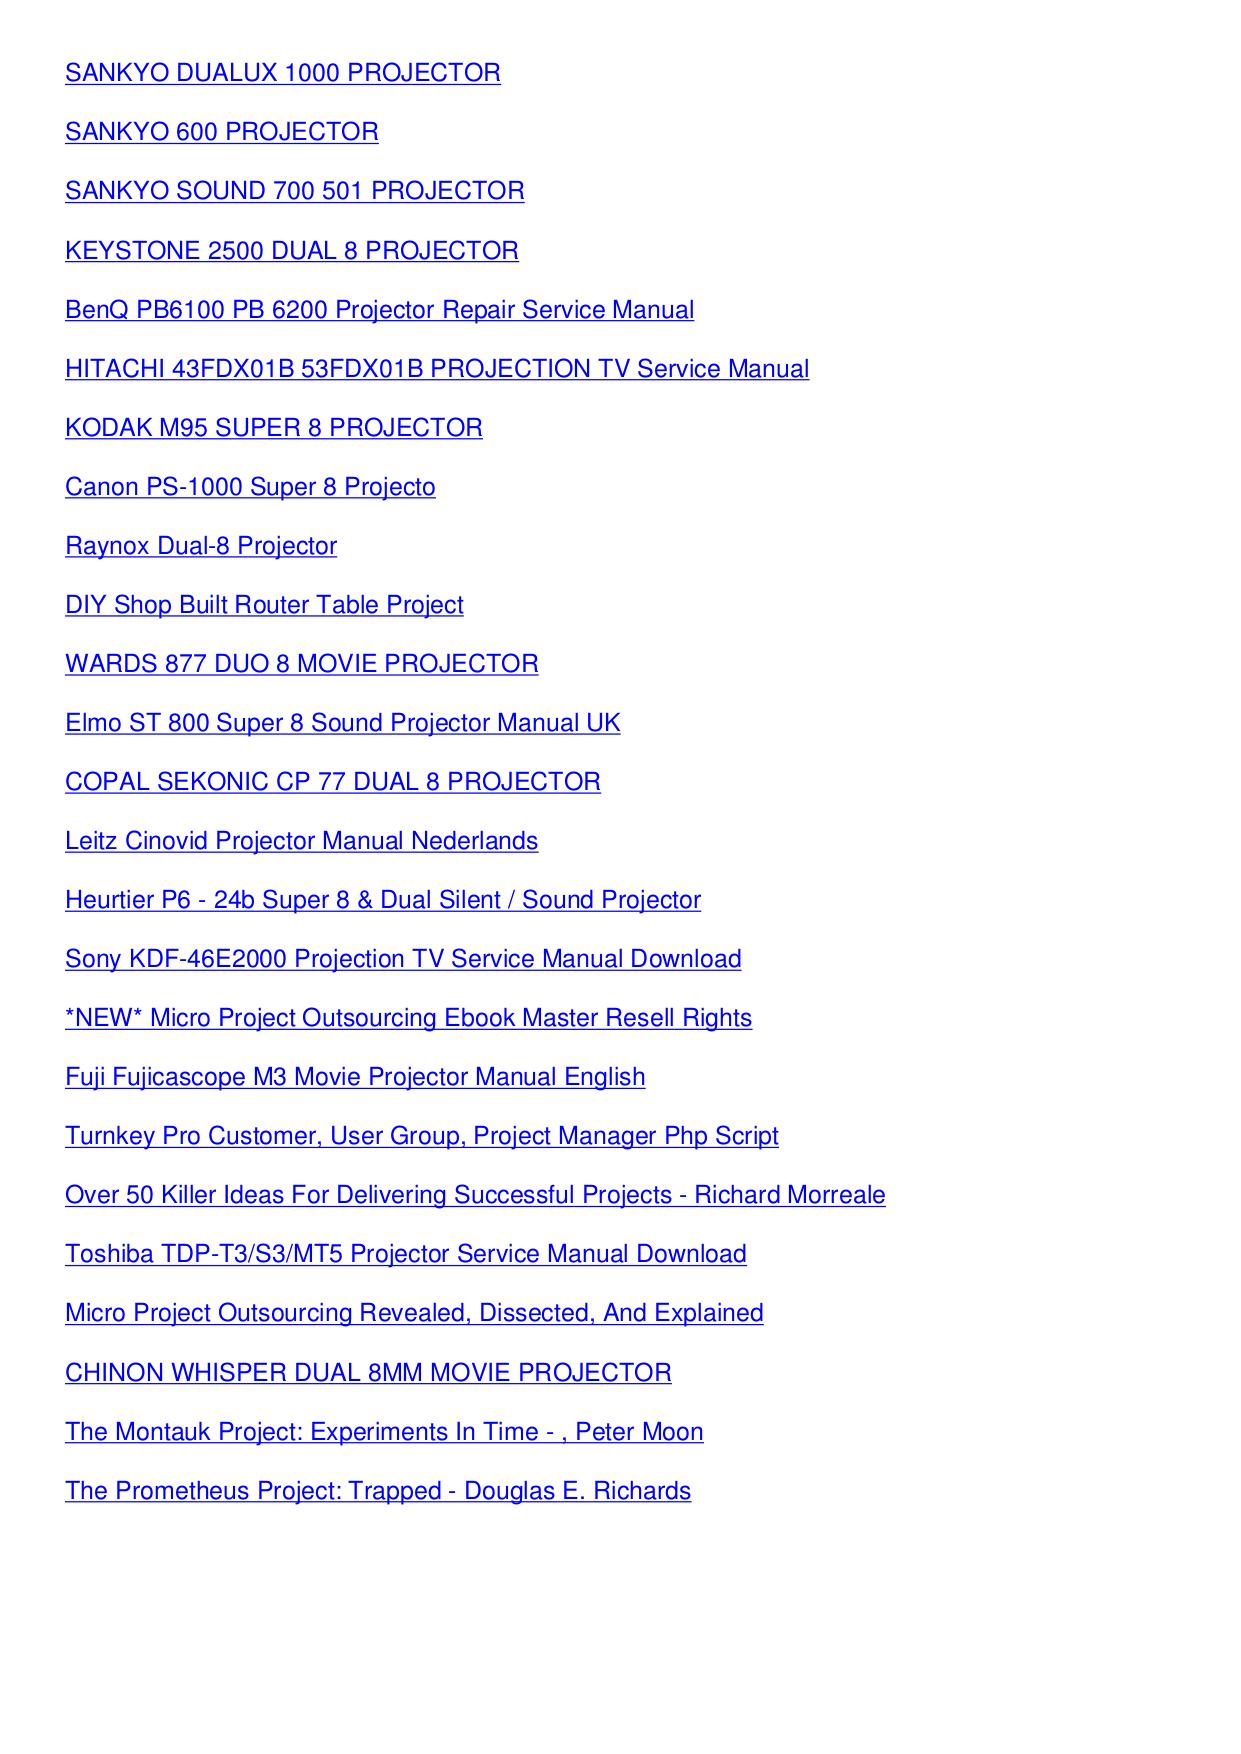 PDF manual for Sony Projector VPL-VW11HT